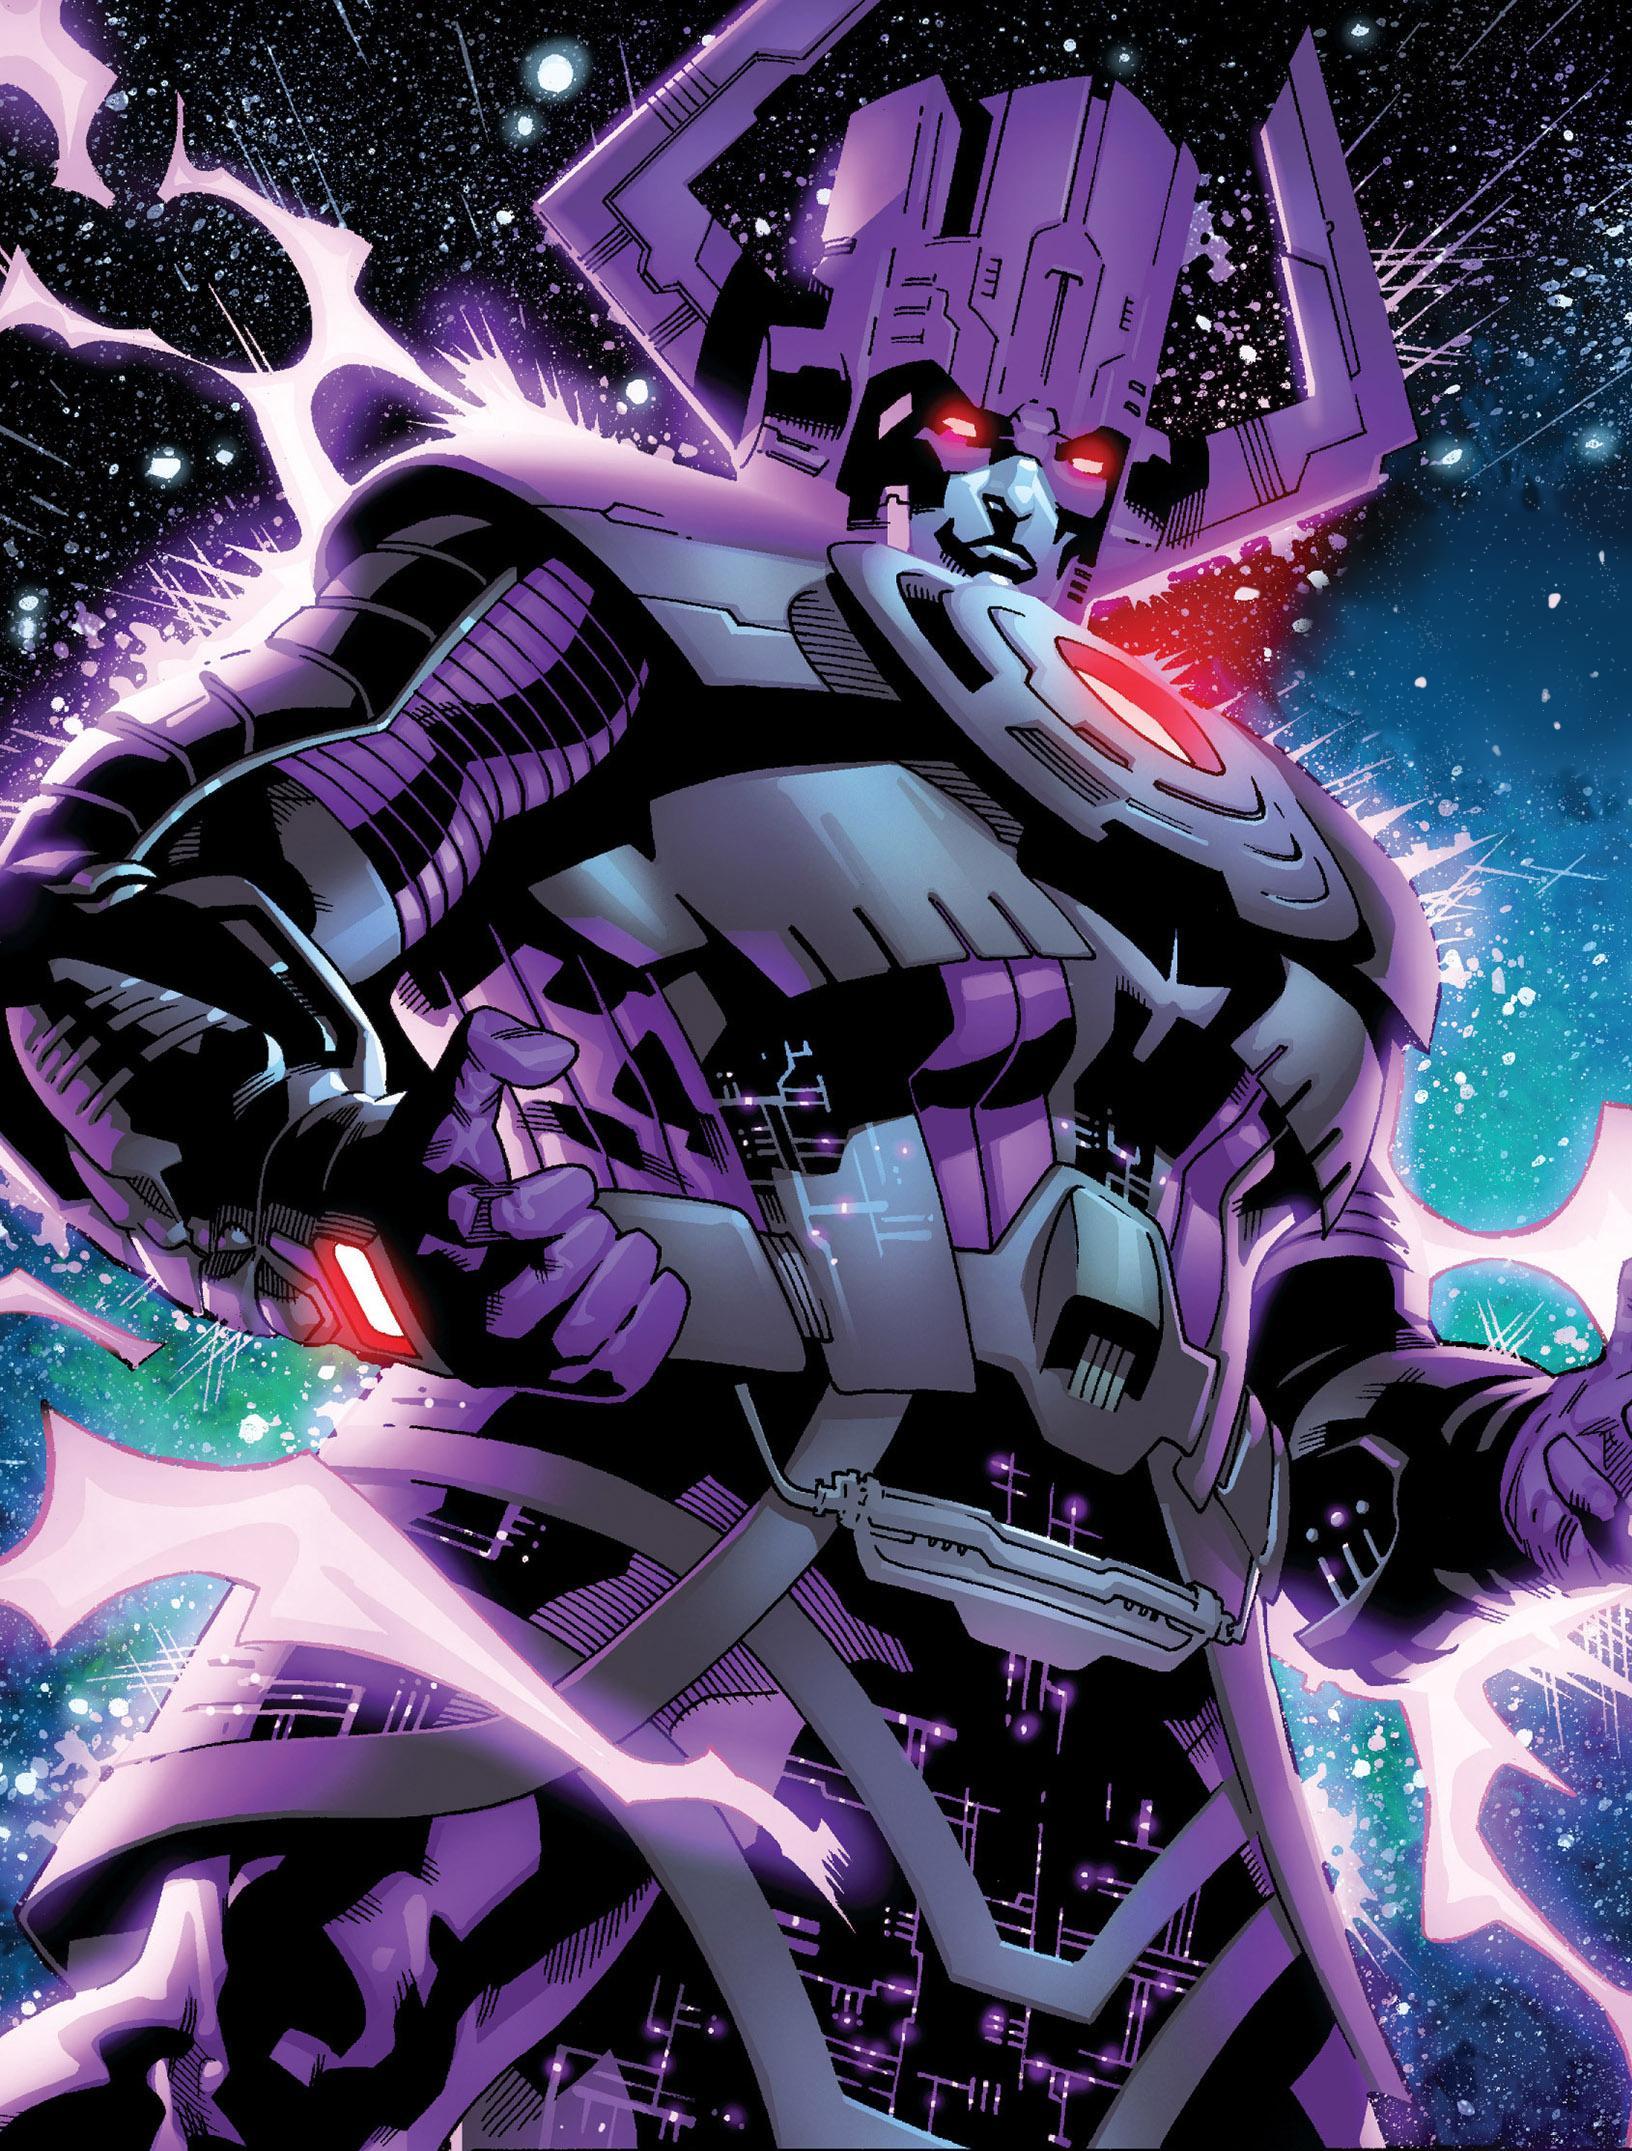 Galactus (Earth-616) | Spider-Man Wiki | FANDOM powered by Wikia